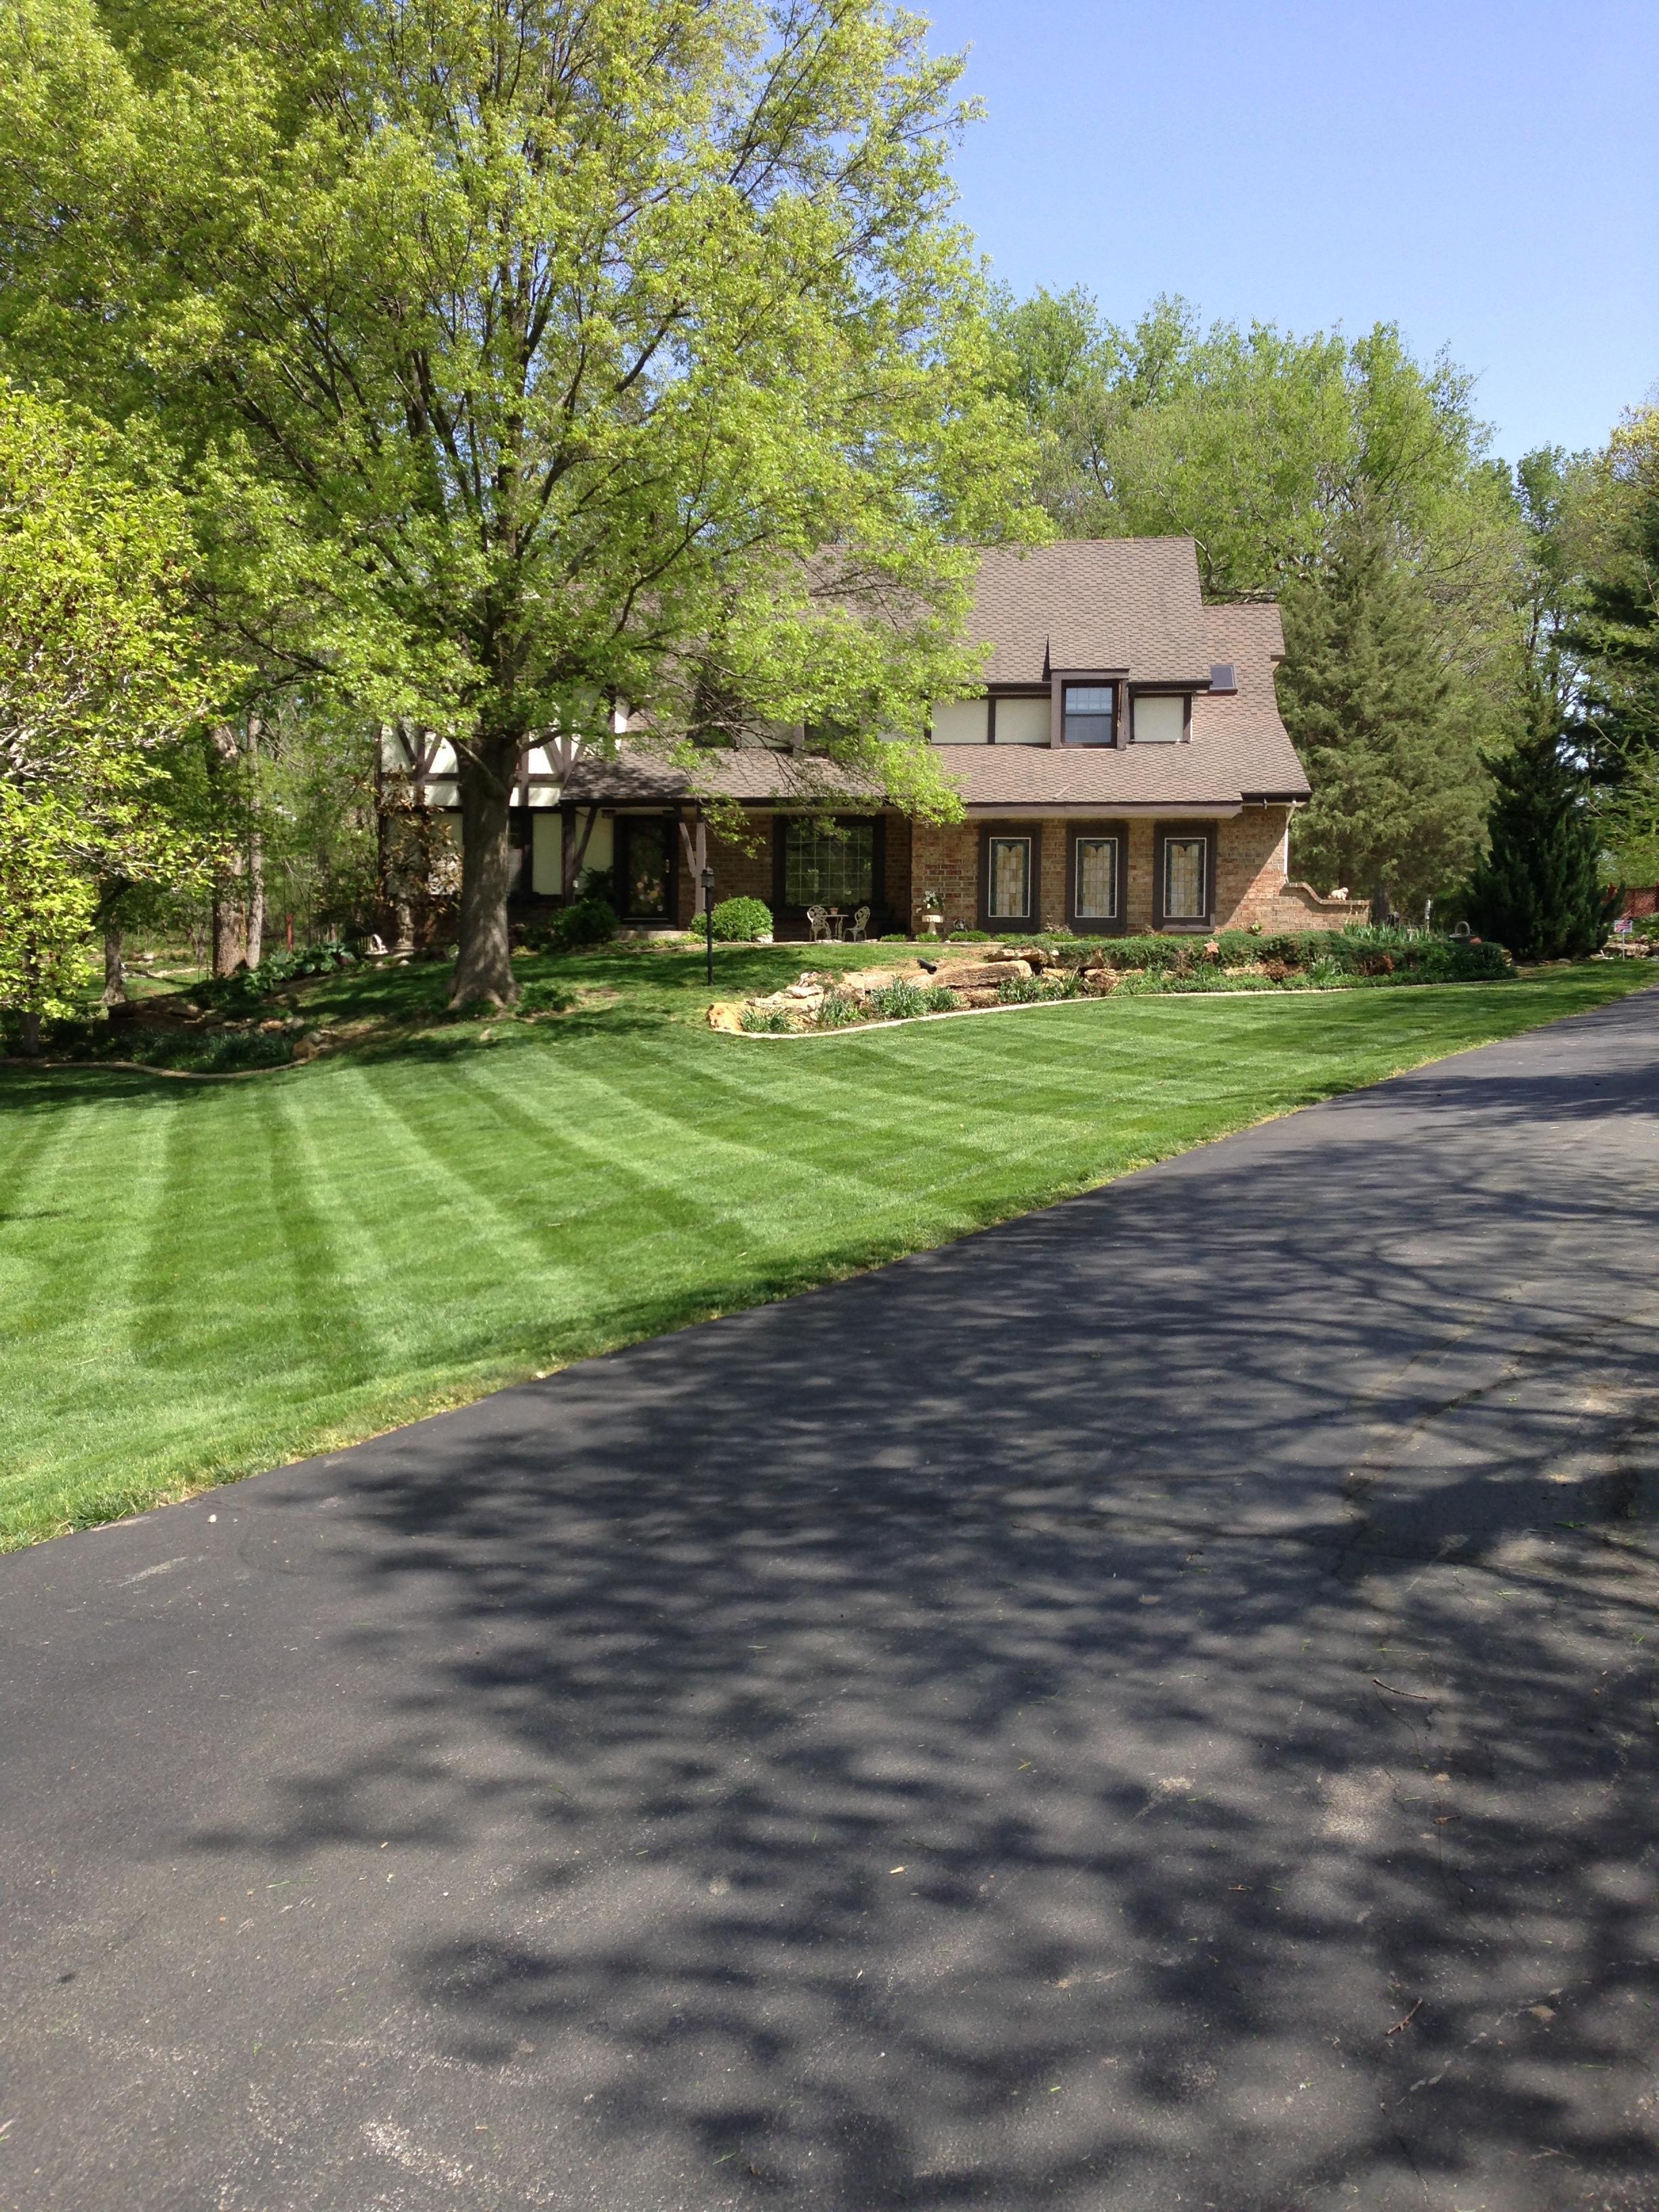 Bradford Street Lawn & Landscaping, LLC image 4